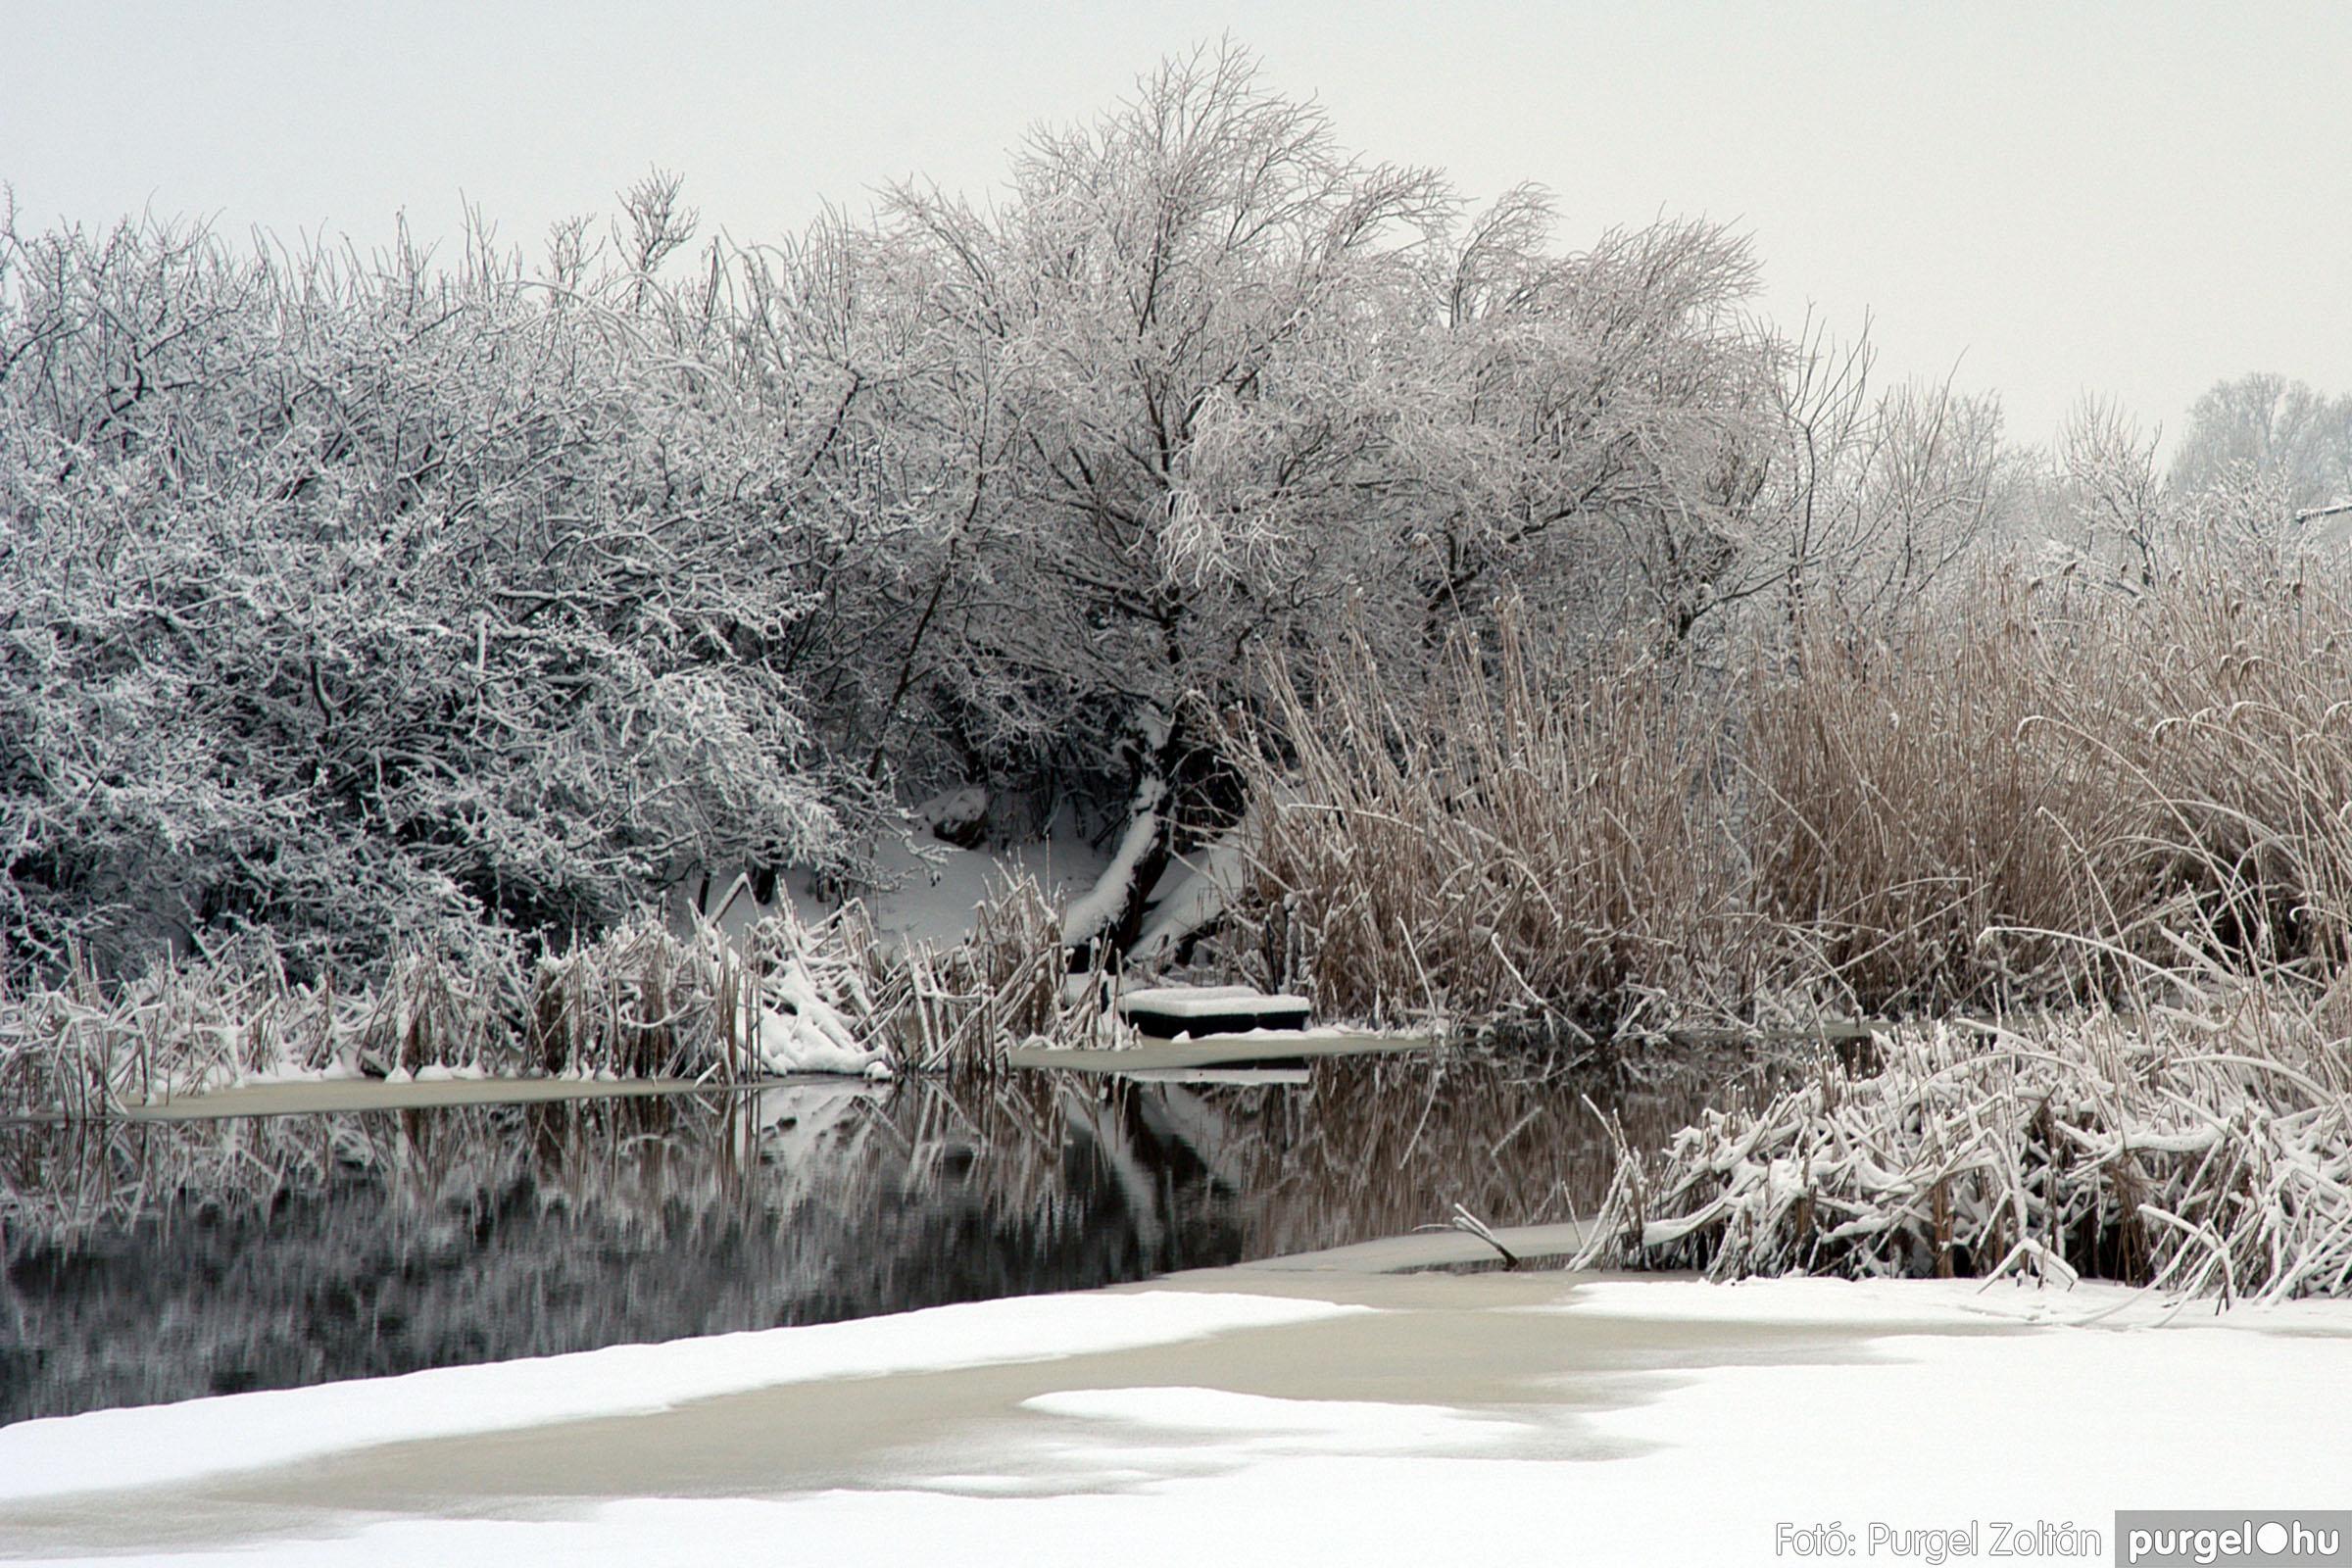 021 Örök pillanatok fotókiállításom képei - Kurca télen · Kurca channel in winter - Fotó:PURGEL ZOLTÁN©.jpg